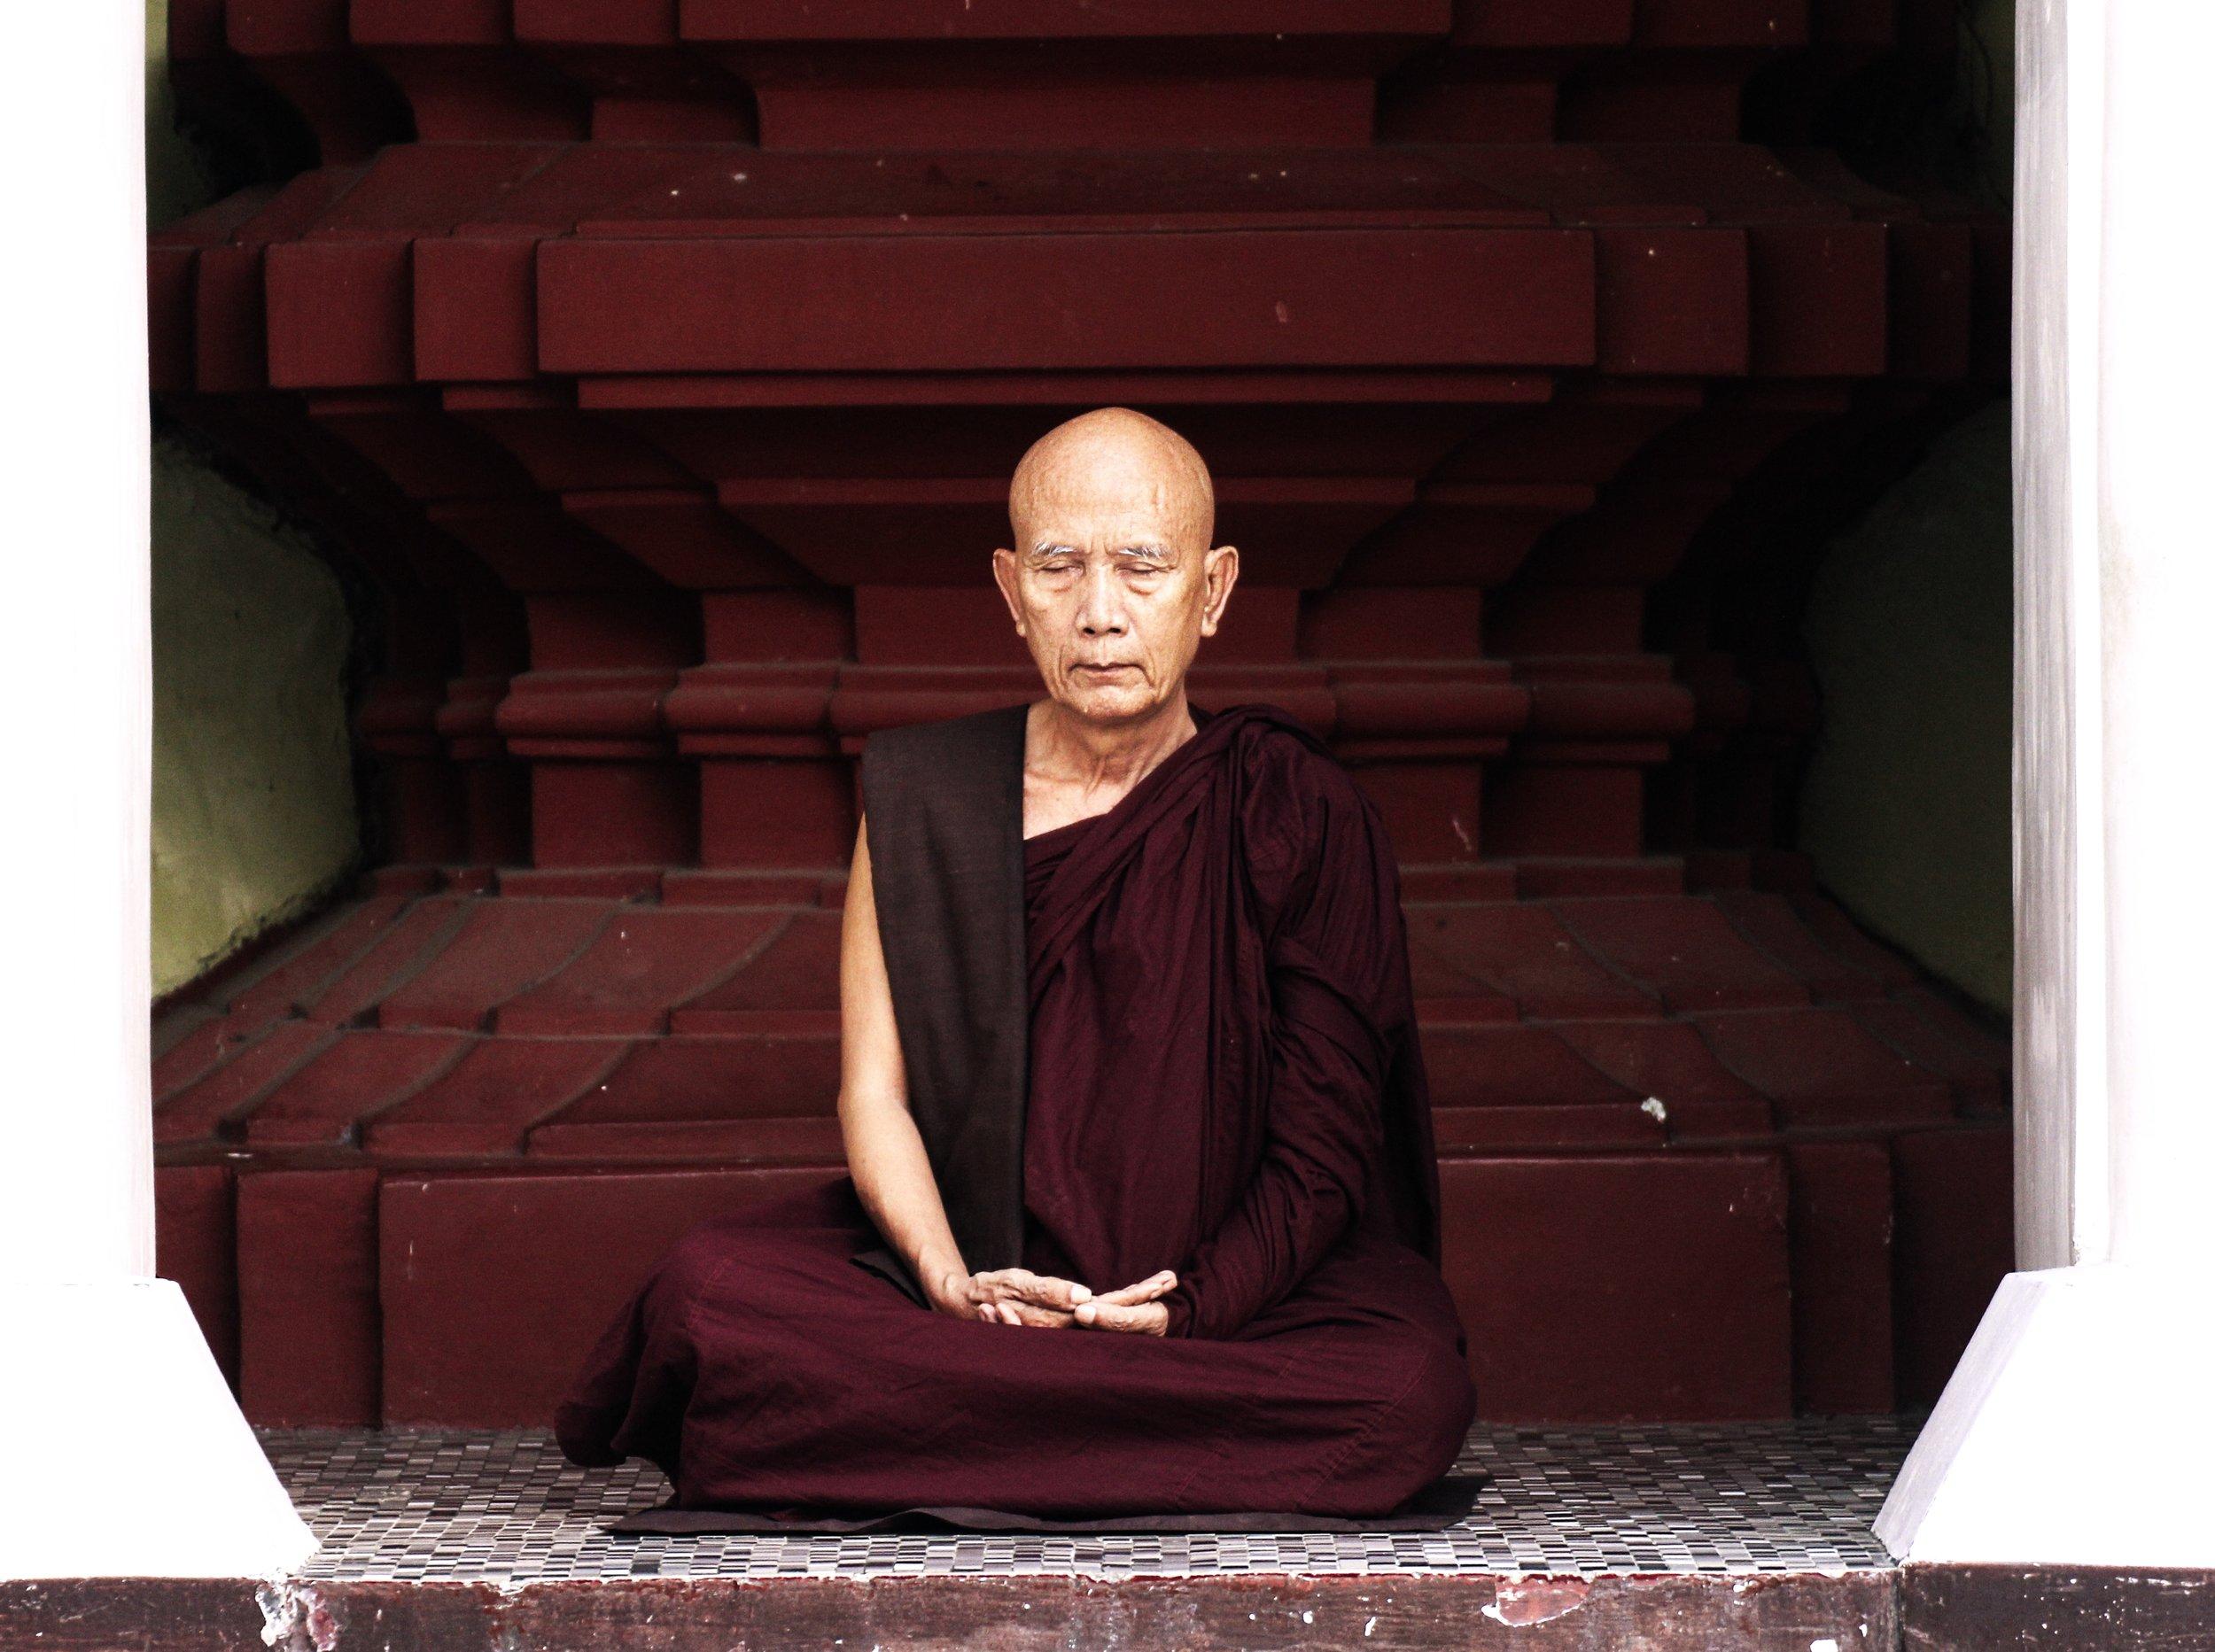 actually a Burmese monk, but I like the photo